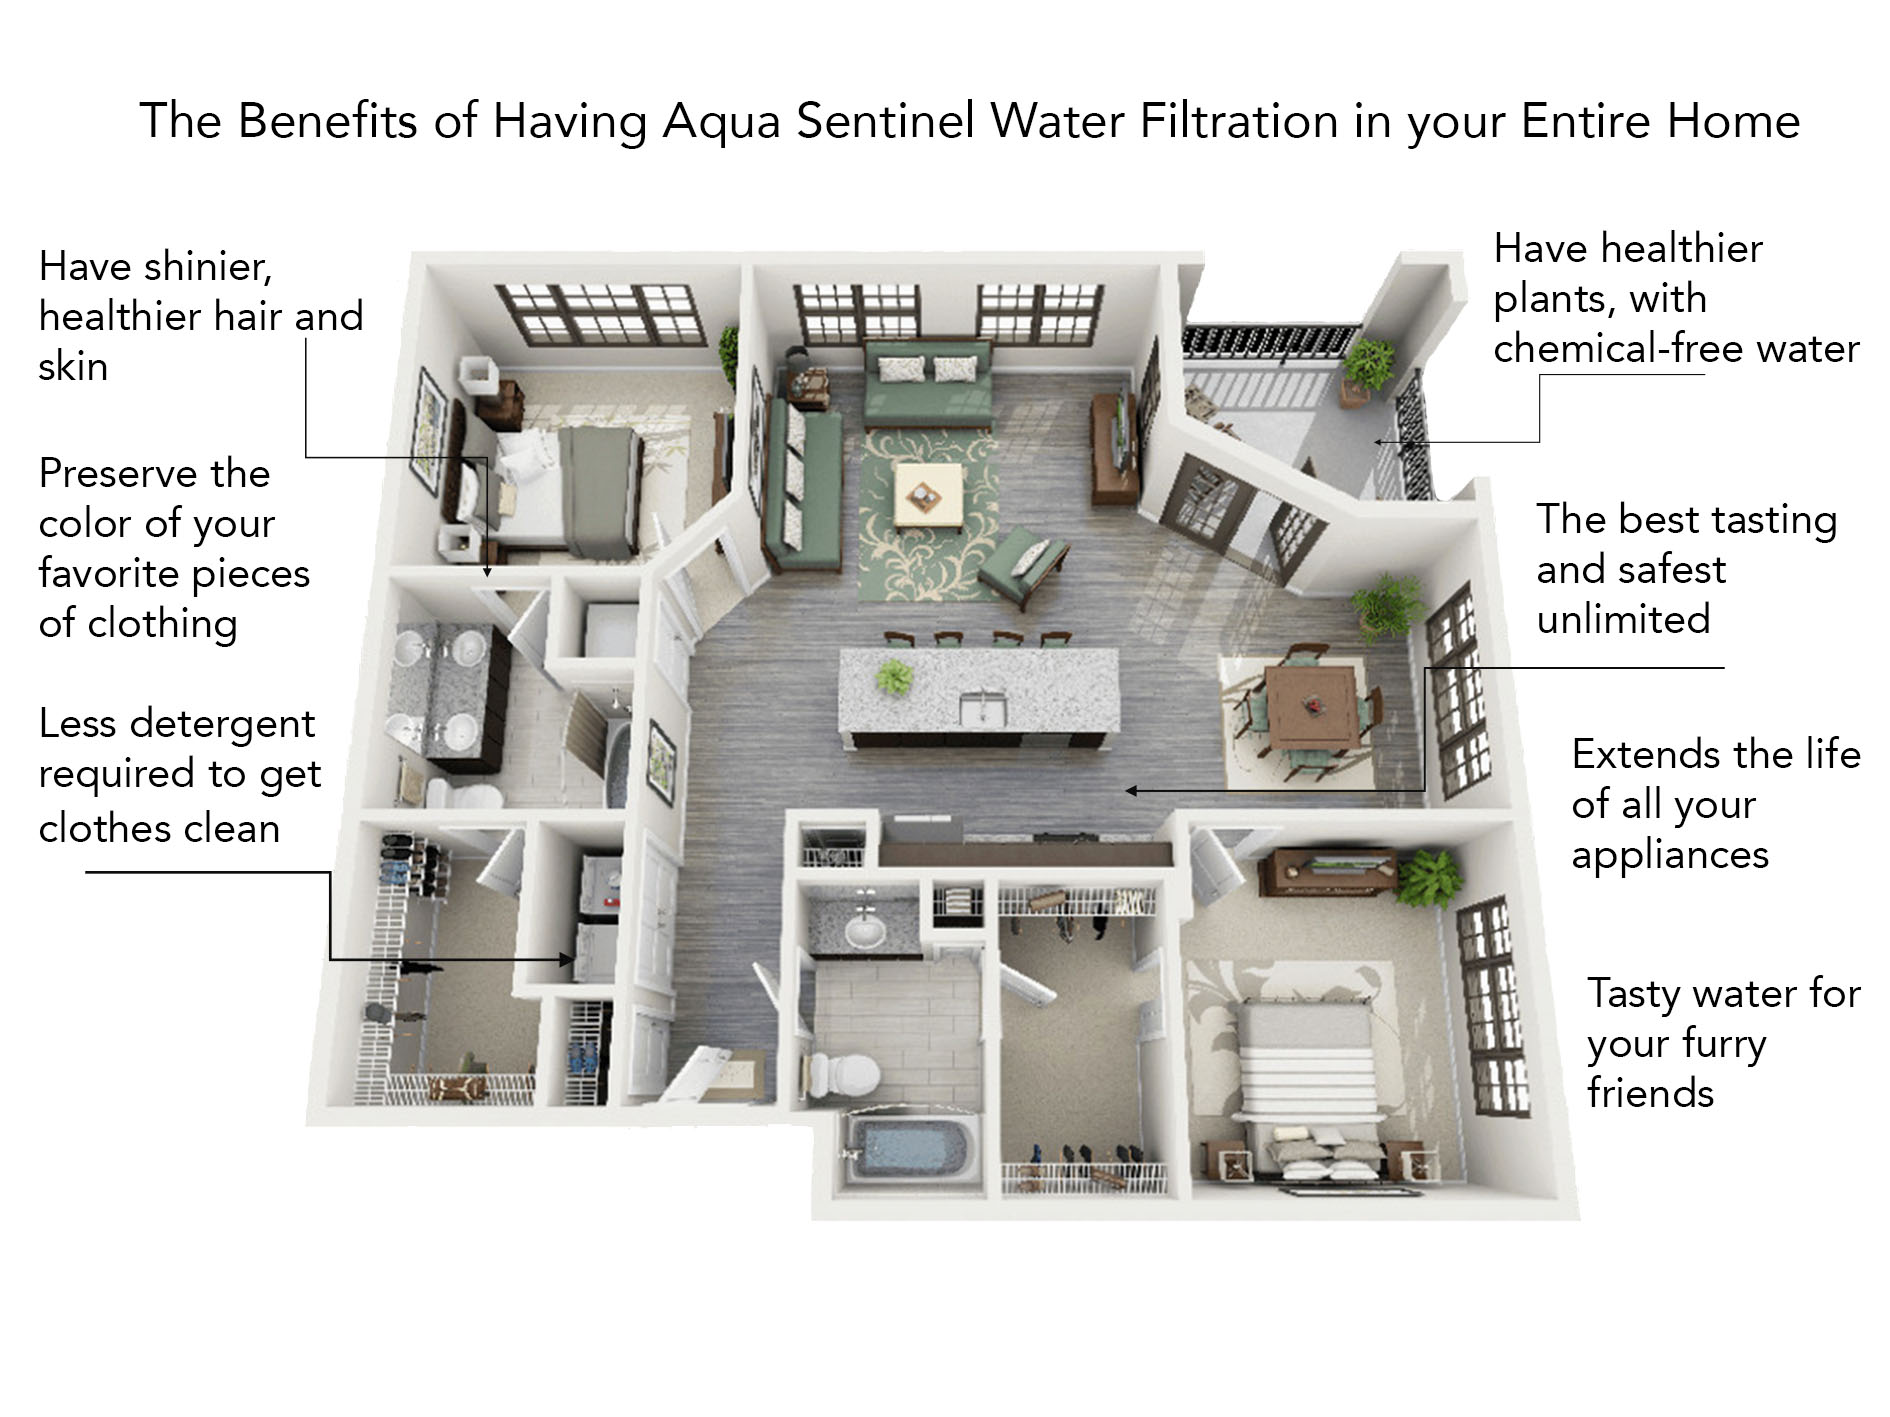 Entire Home Filtration Benefits.jpg